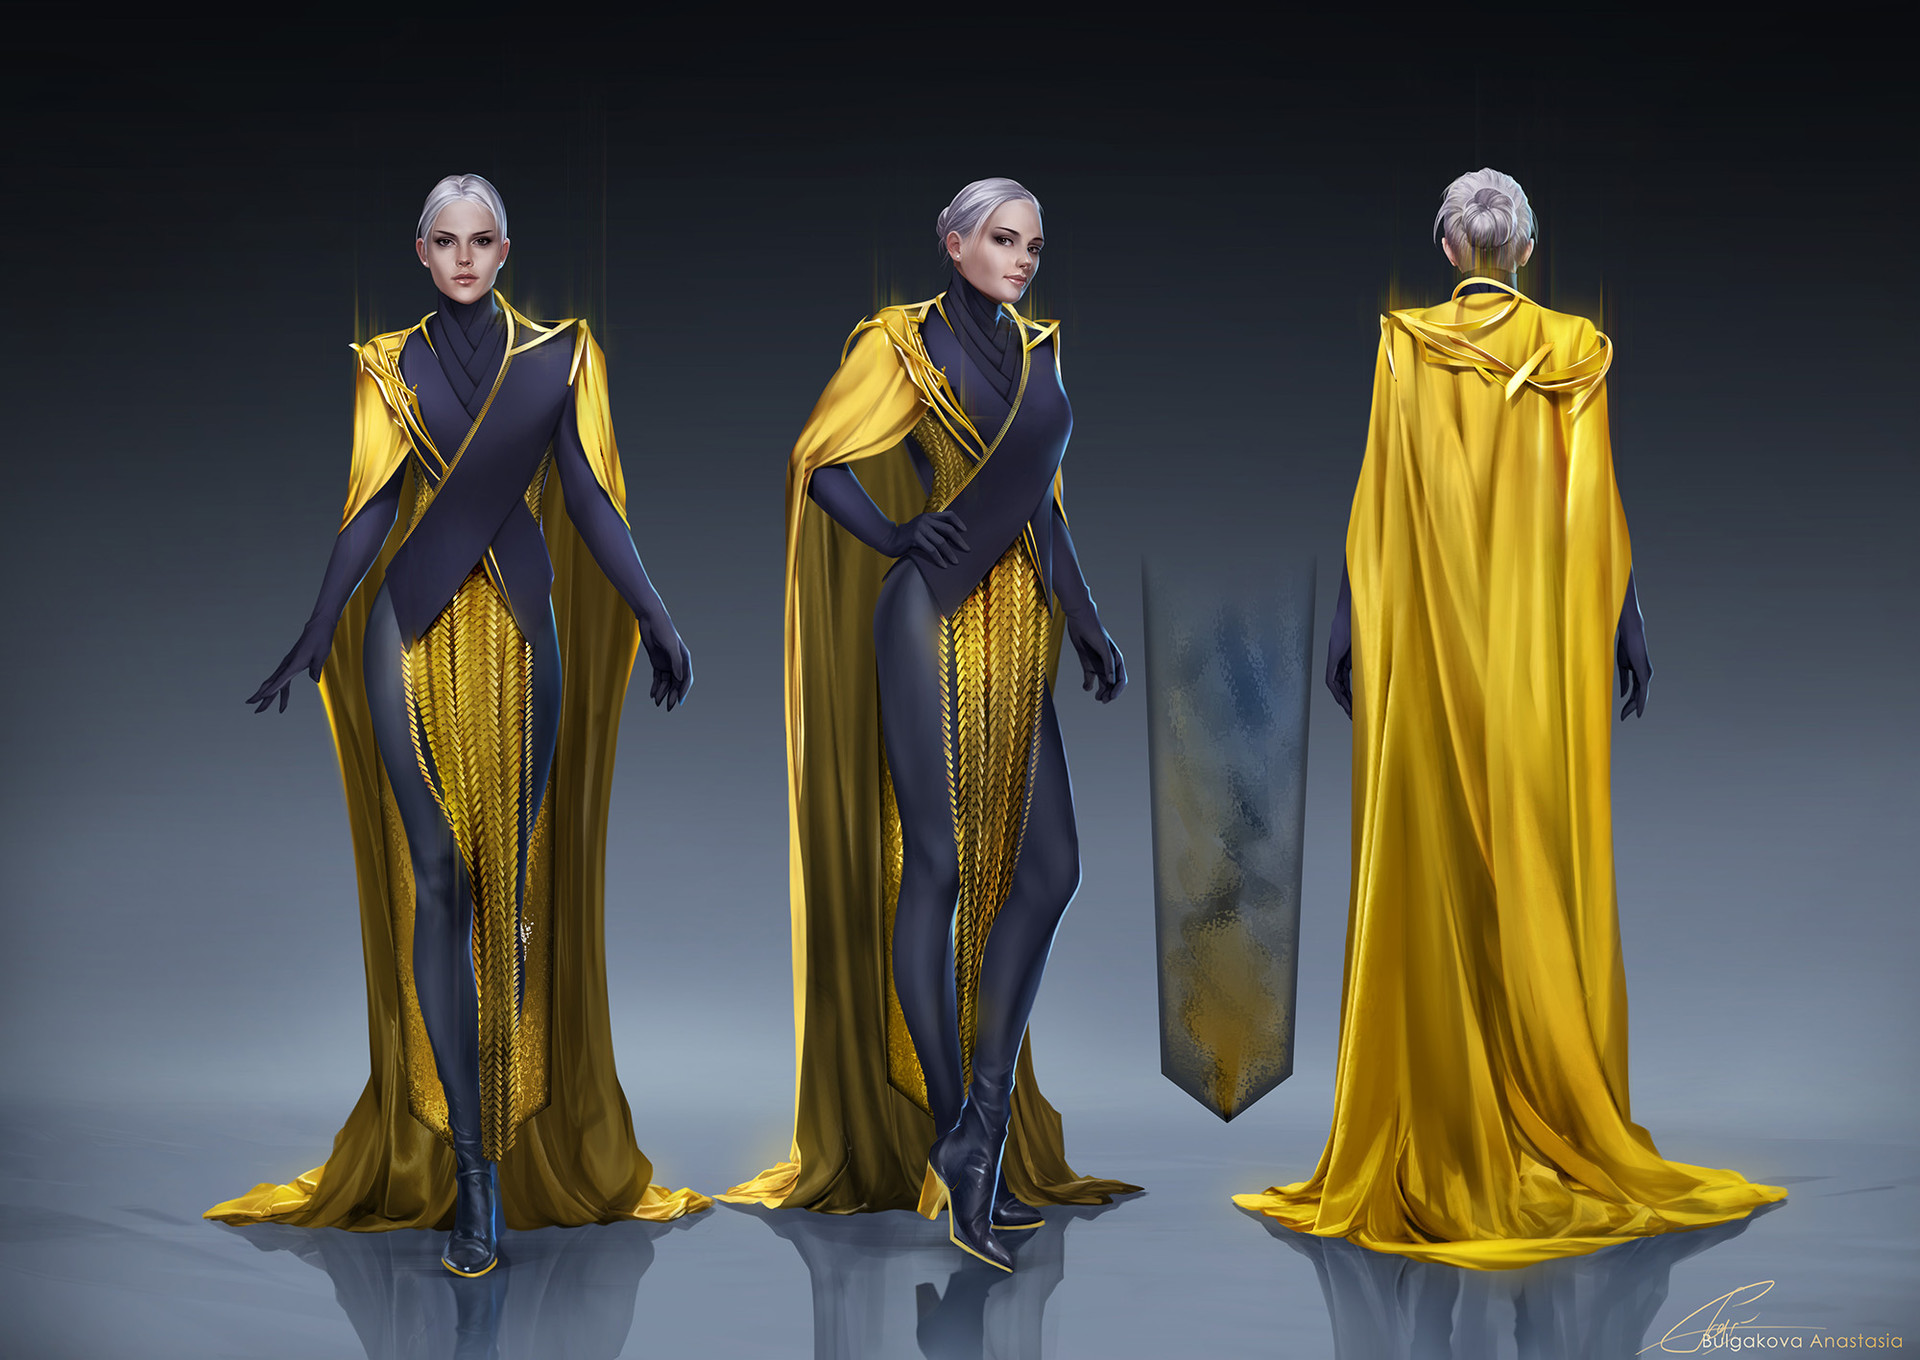 Character Design Jobs Australia : Artstation costume design anastasia bulgakova